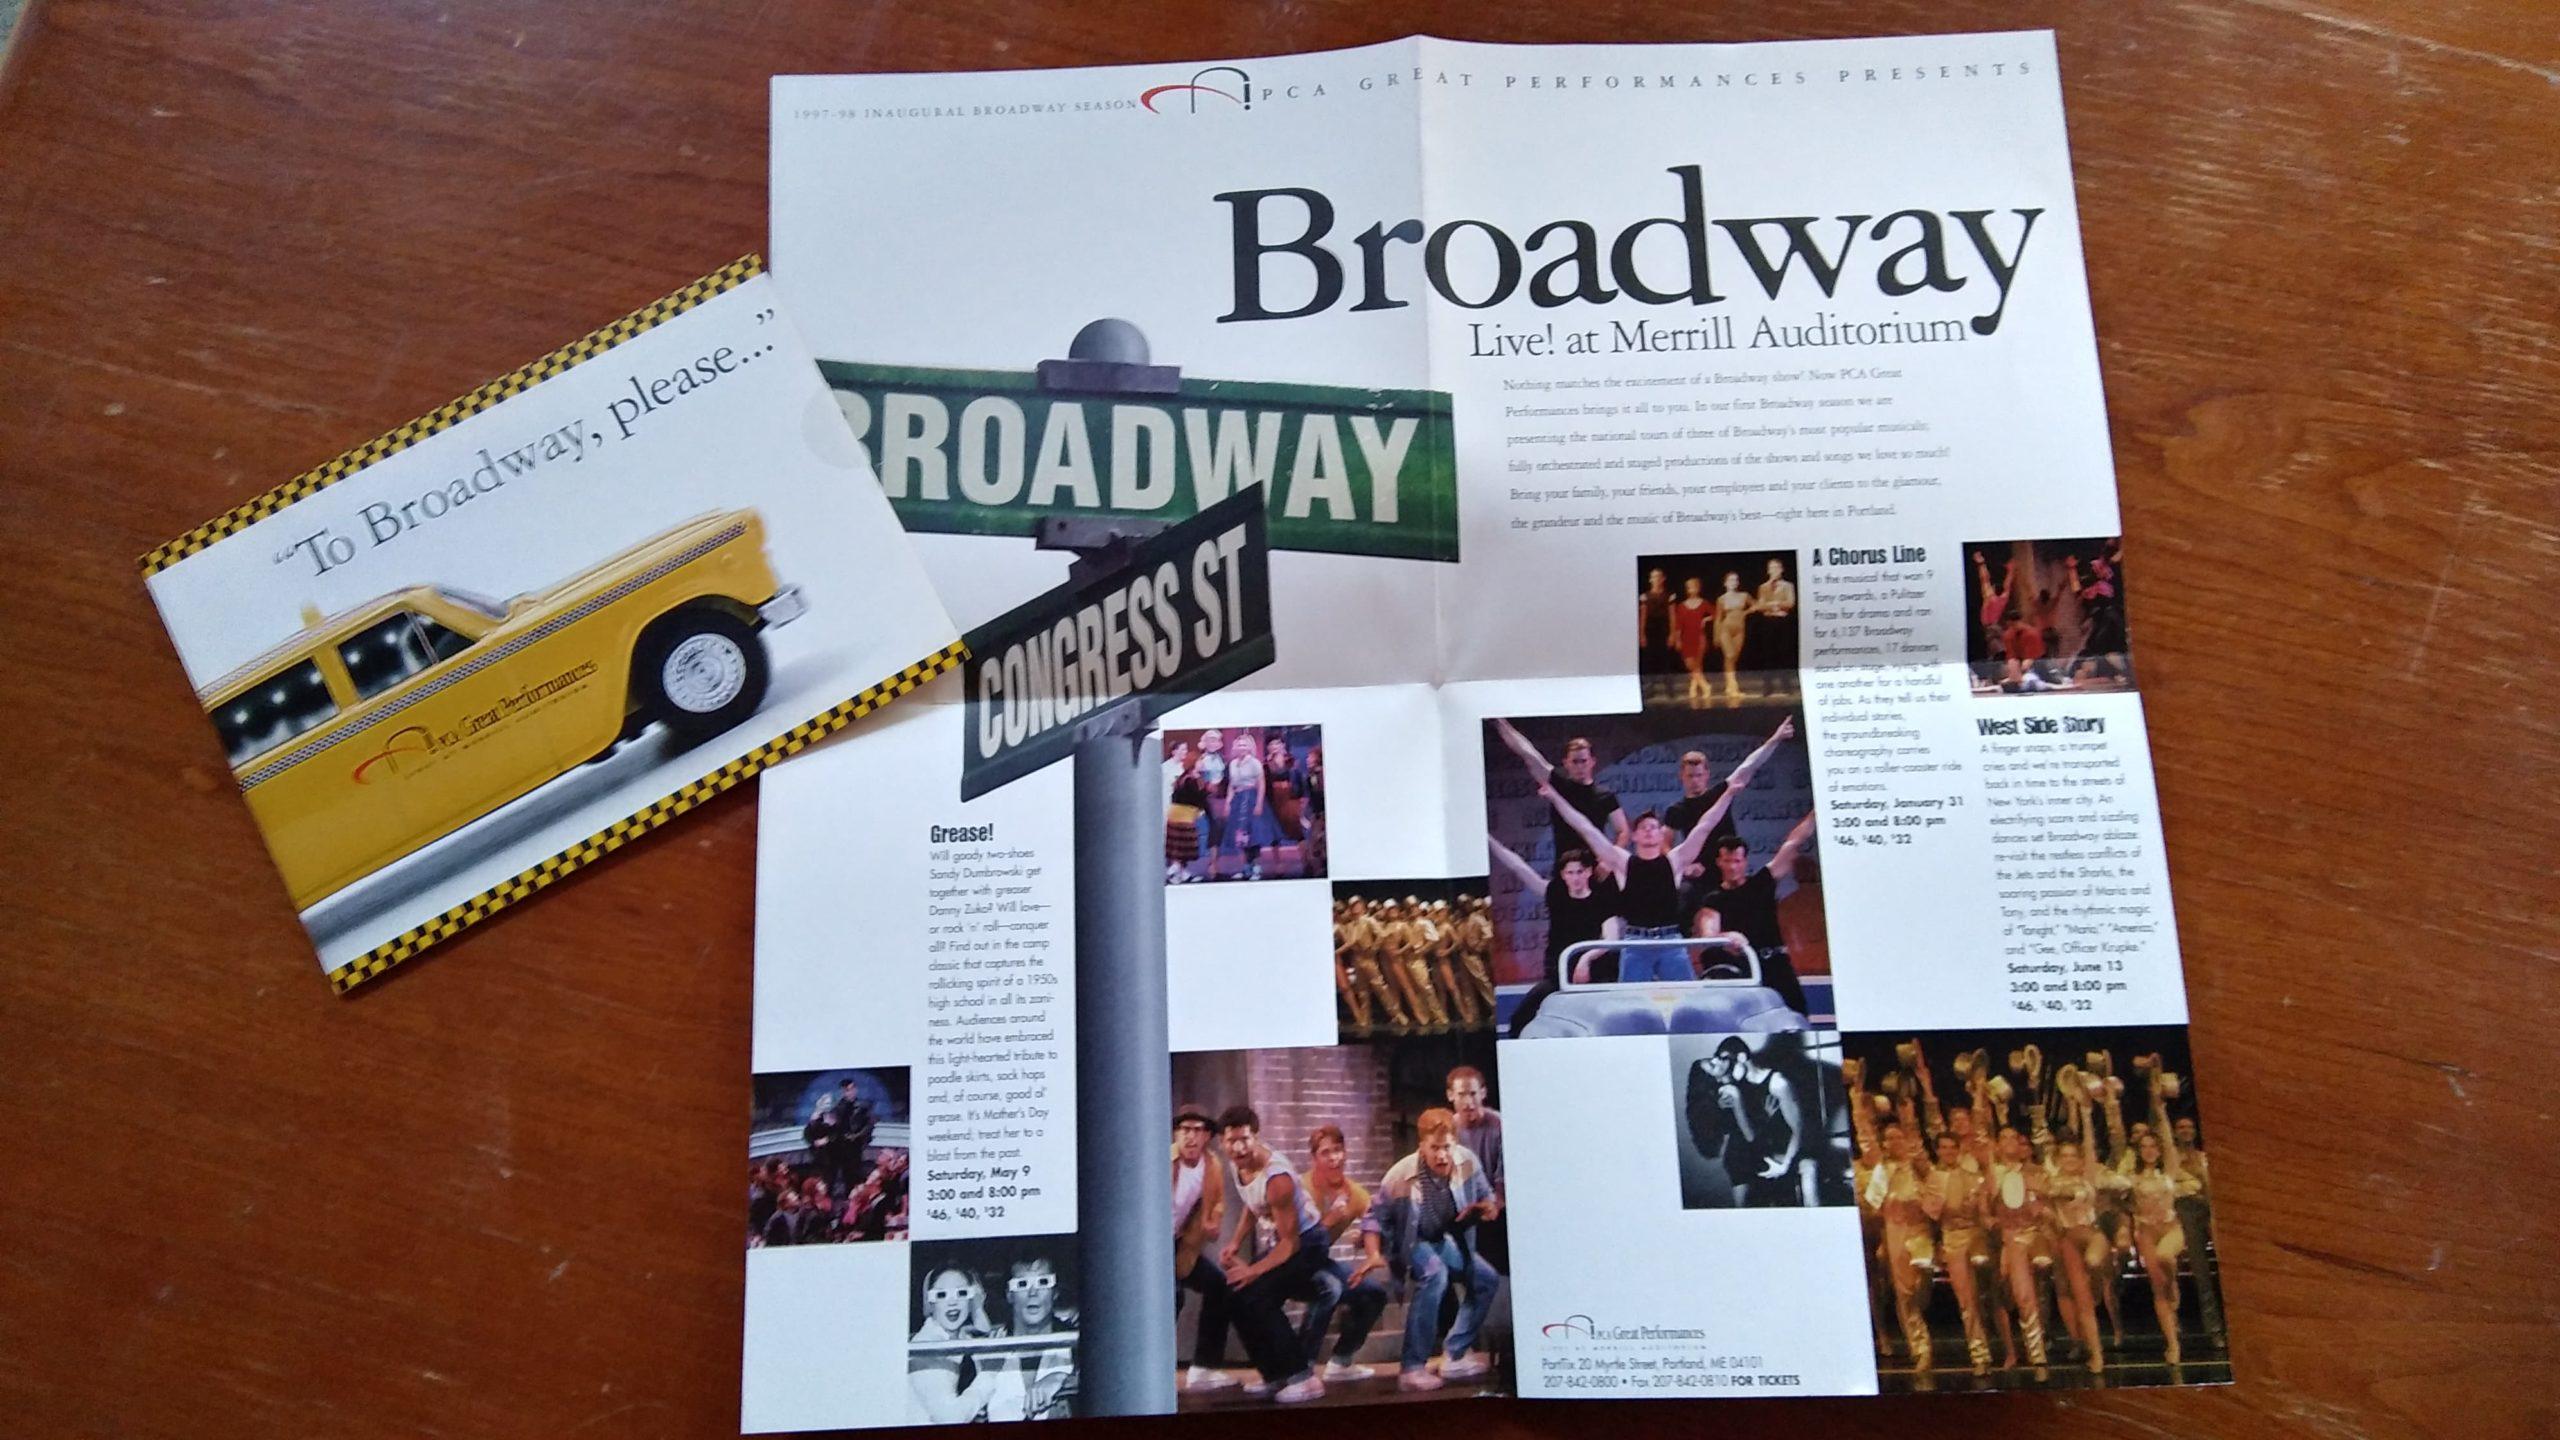 Image of Broadway flier from Ovations' 1997-98 season